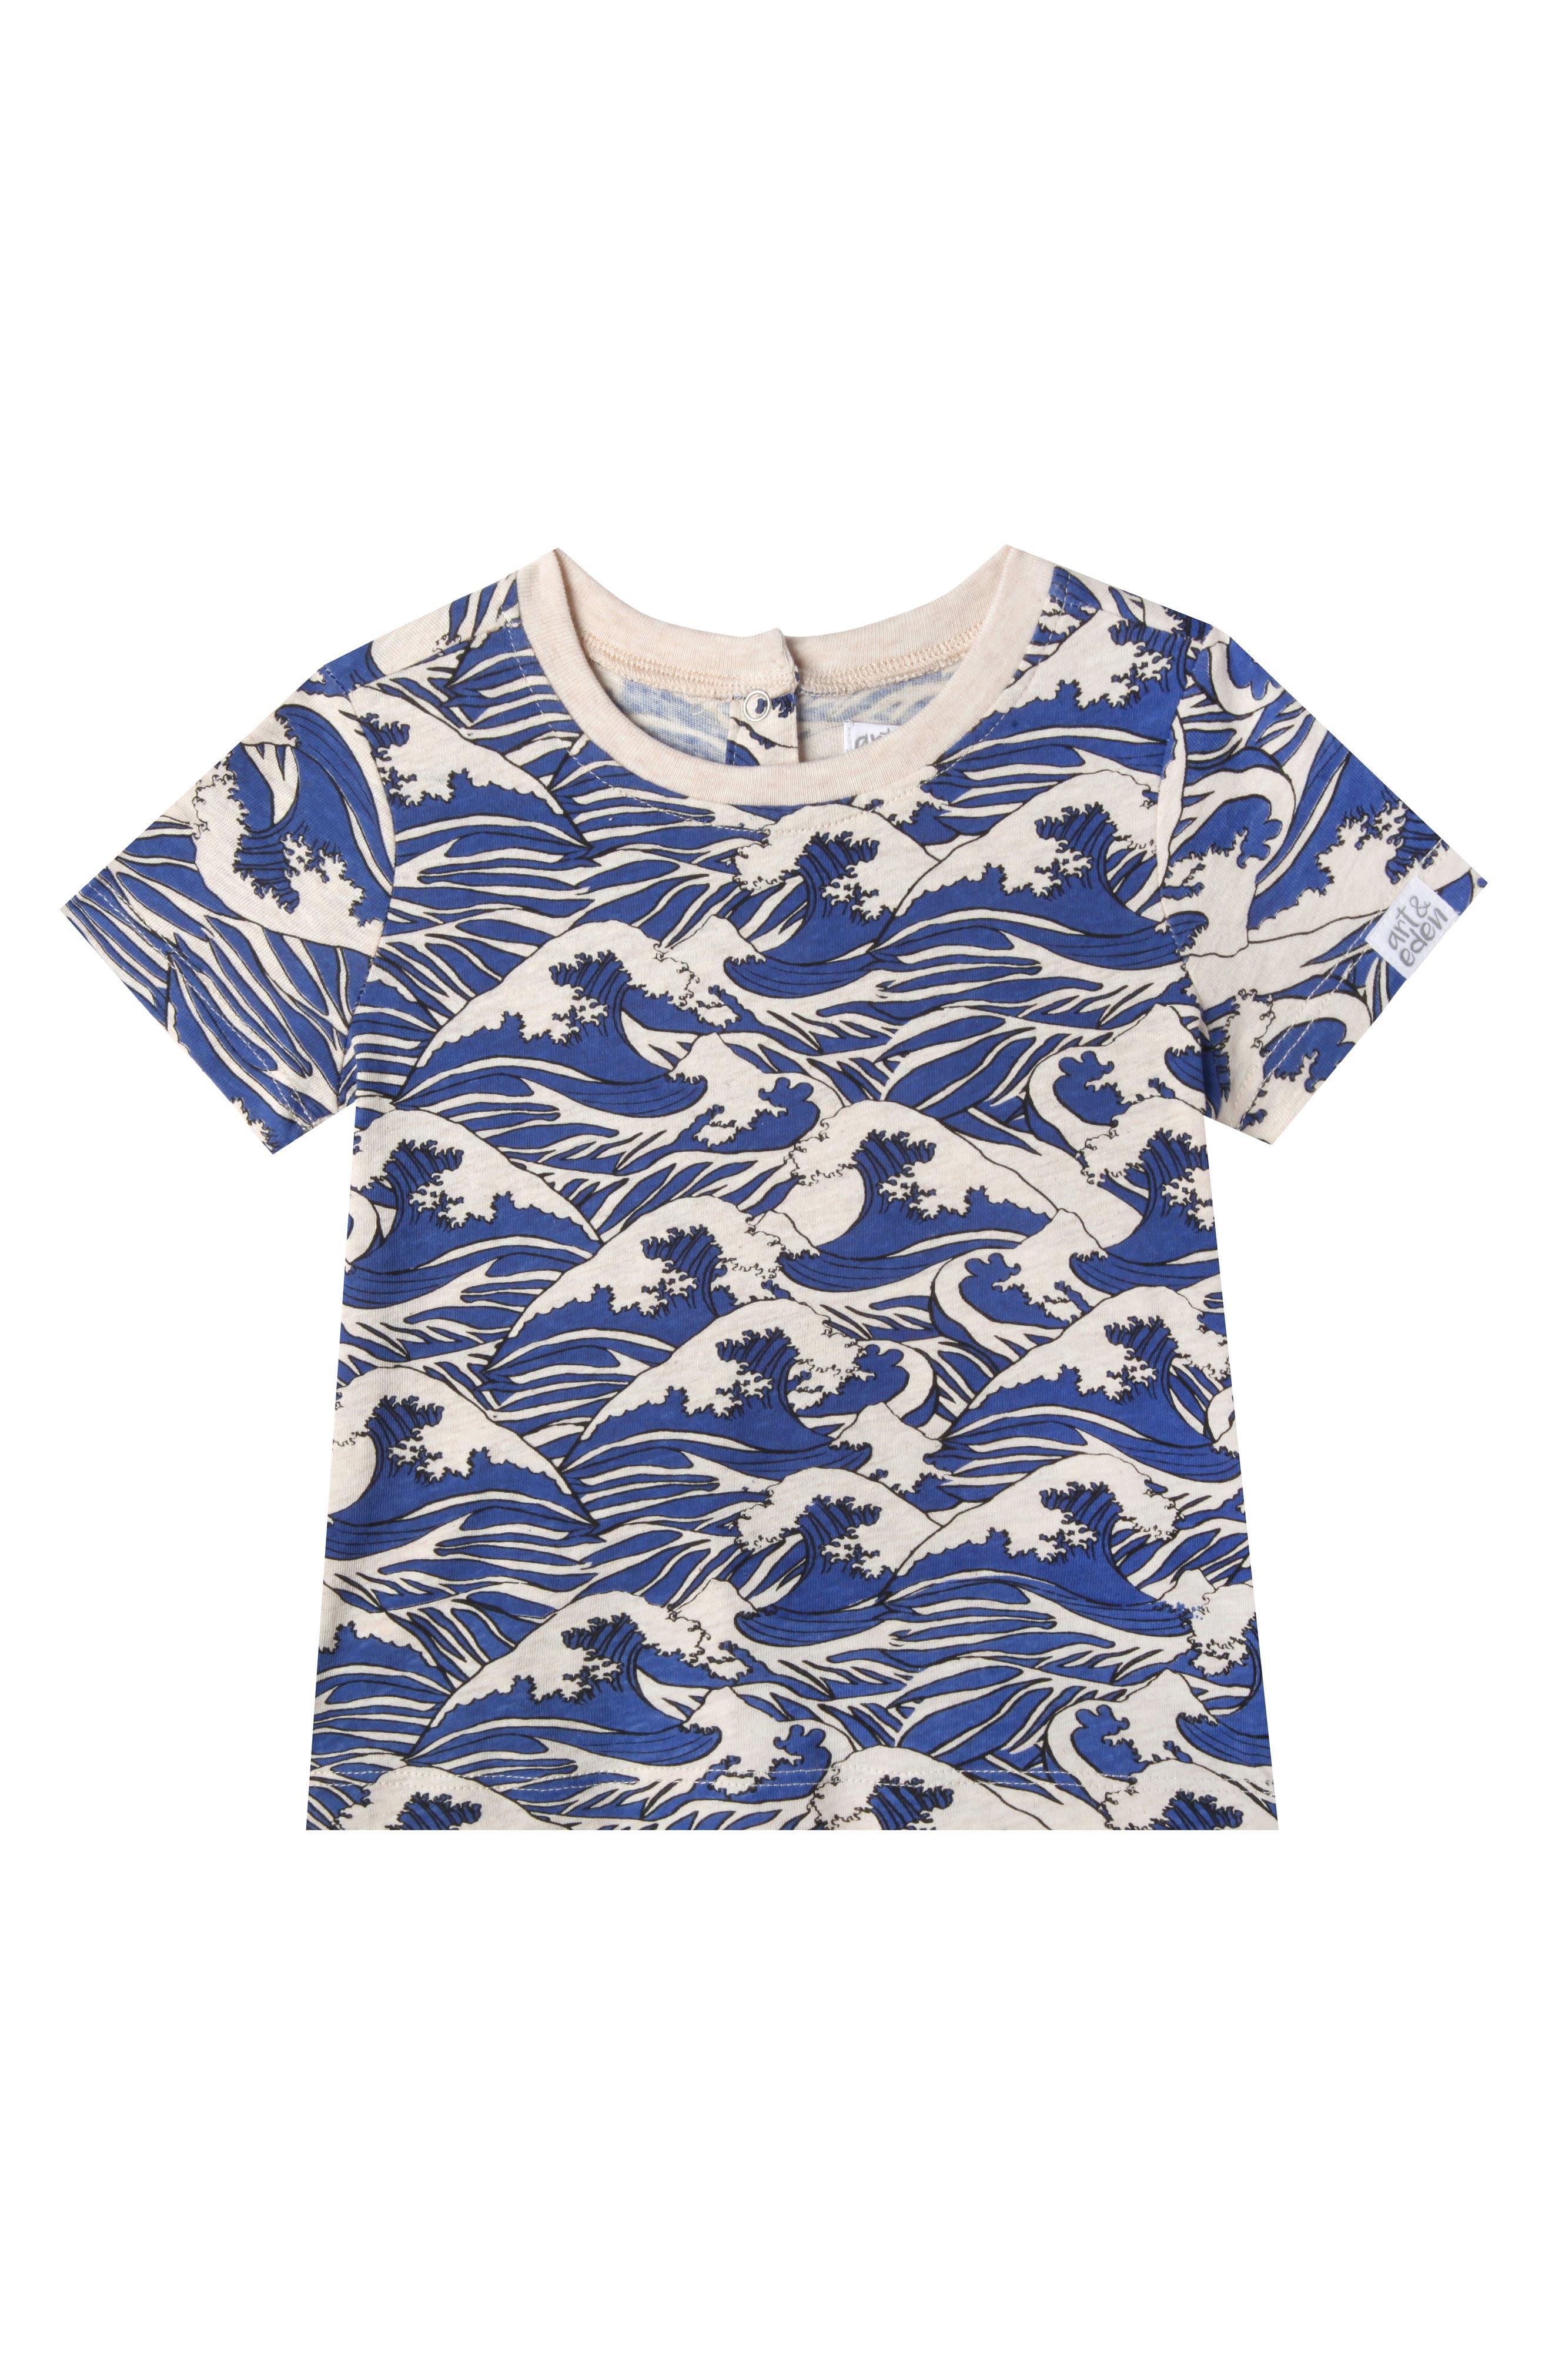 David T-Shirt,                         Main,                         color, Oatmeal Heather